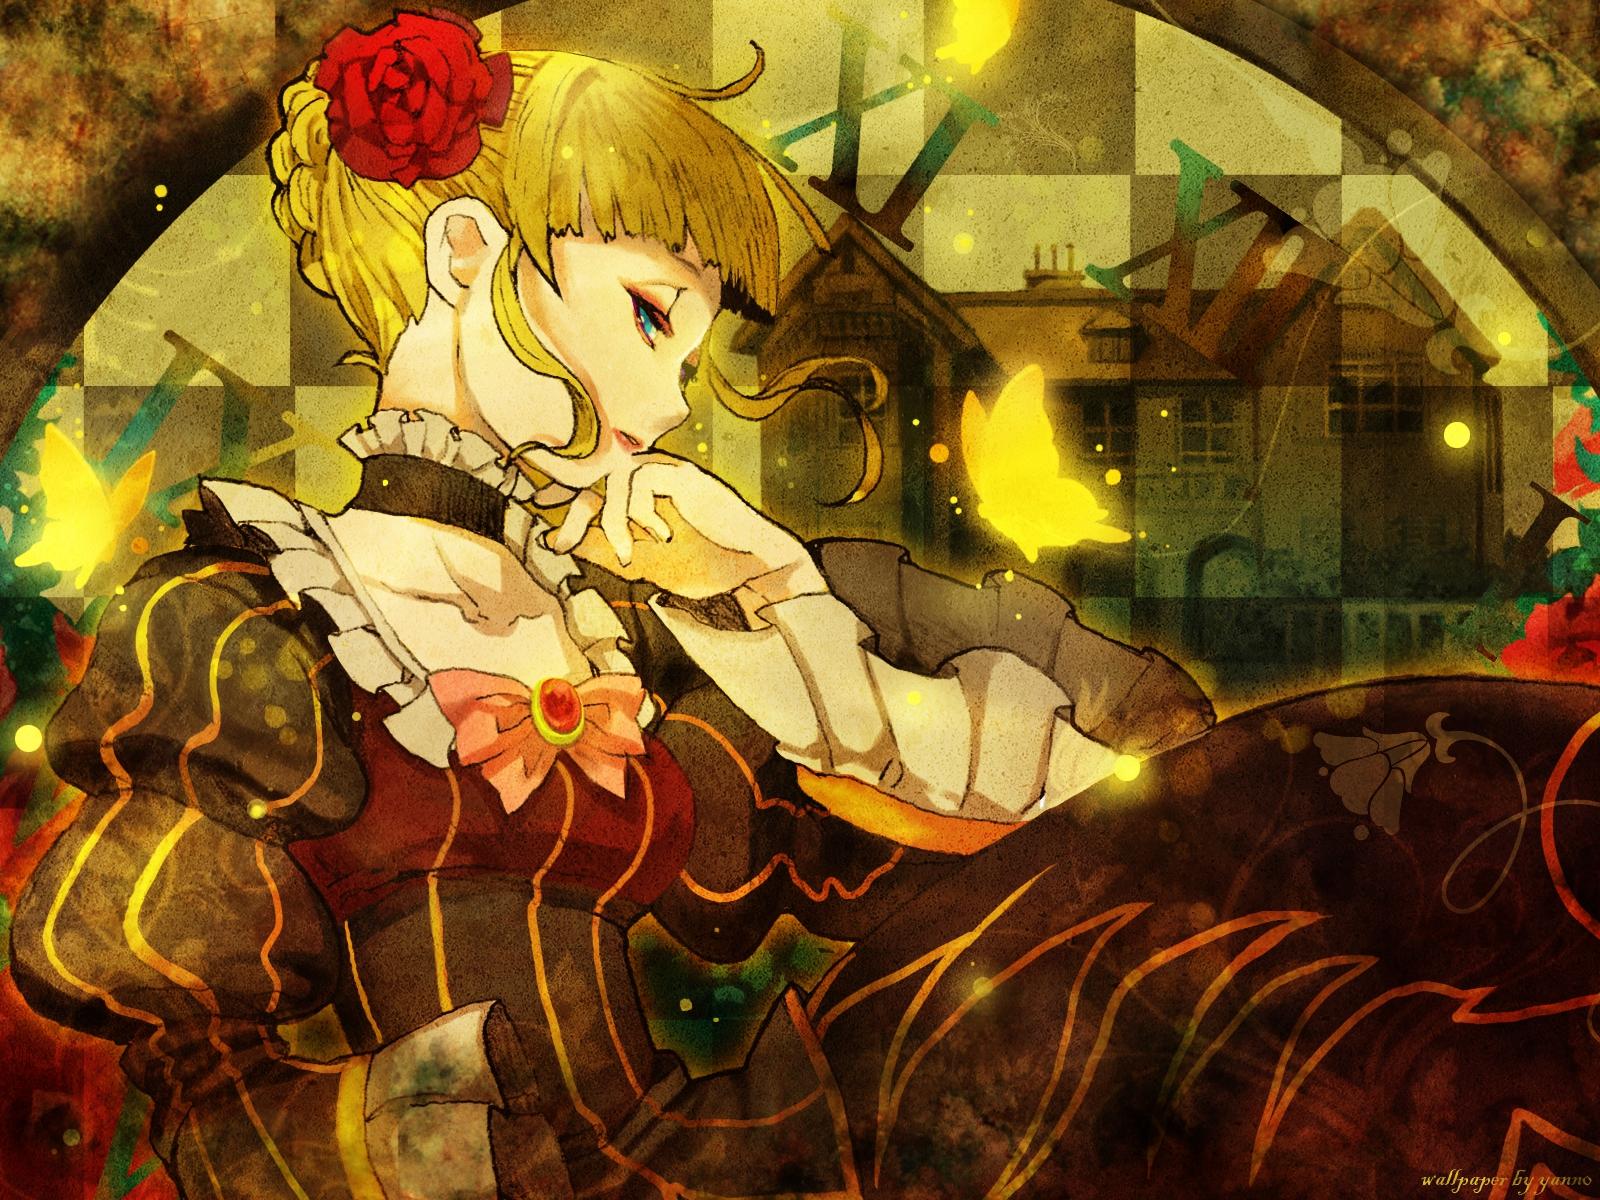 Wallpapers Umineko No Naku Koro Ni Anime